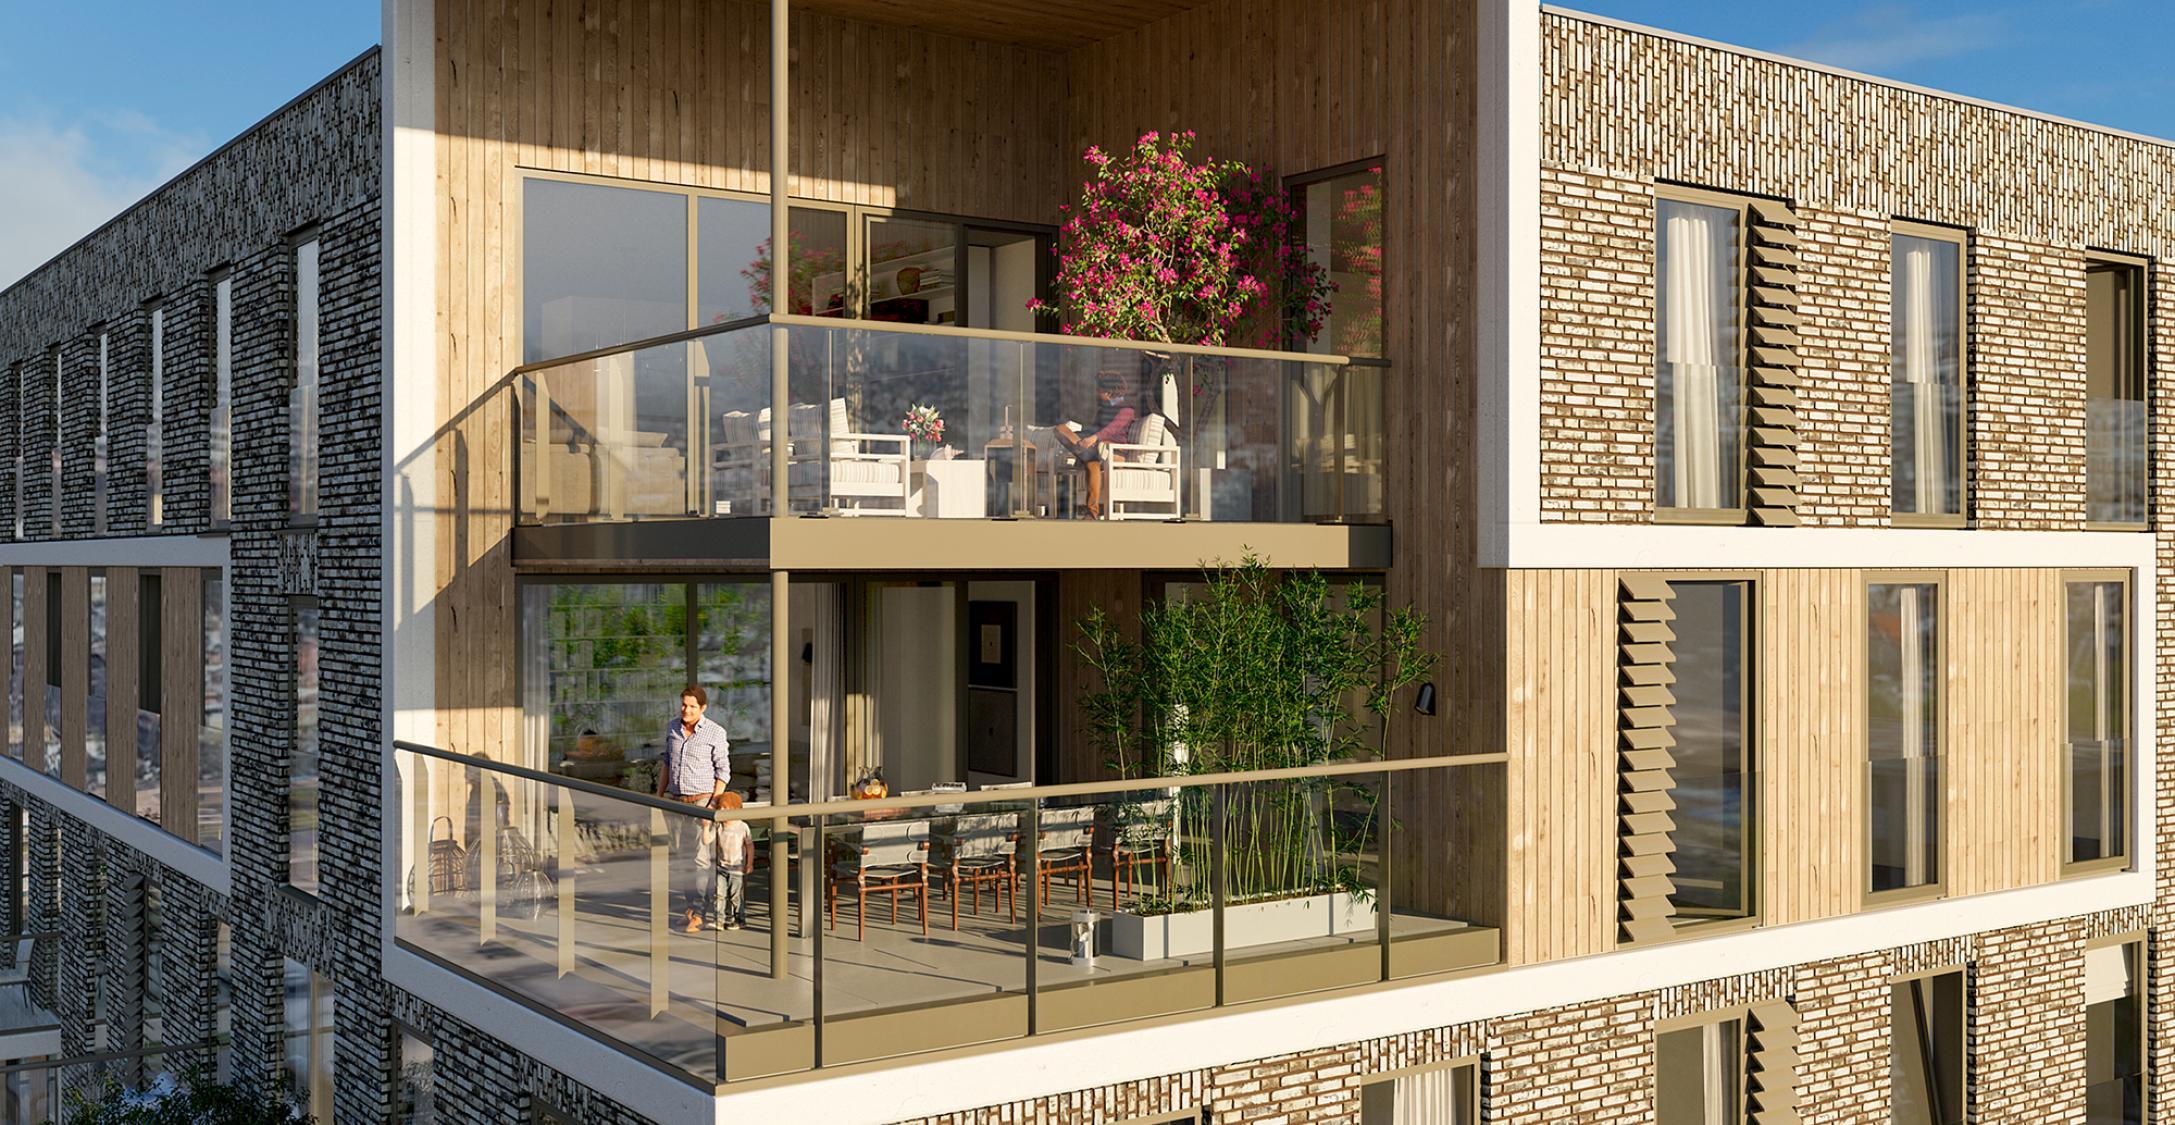 Appartement Point of View Nieuwegein